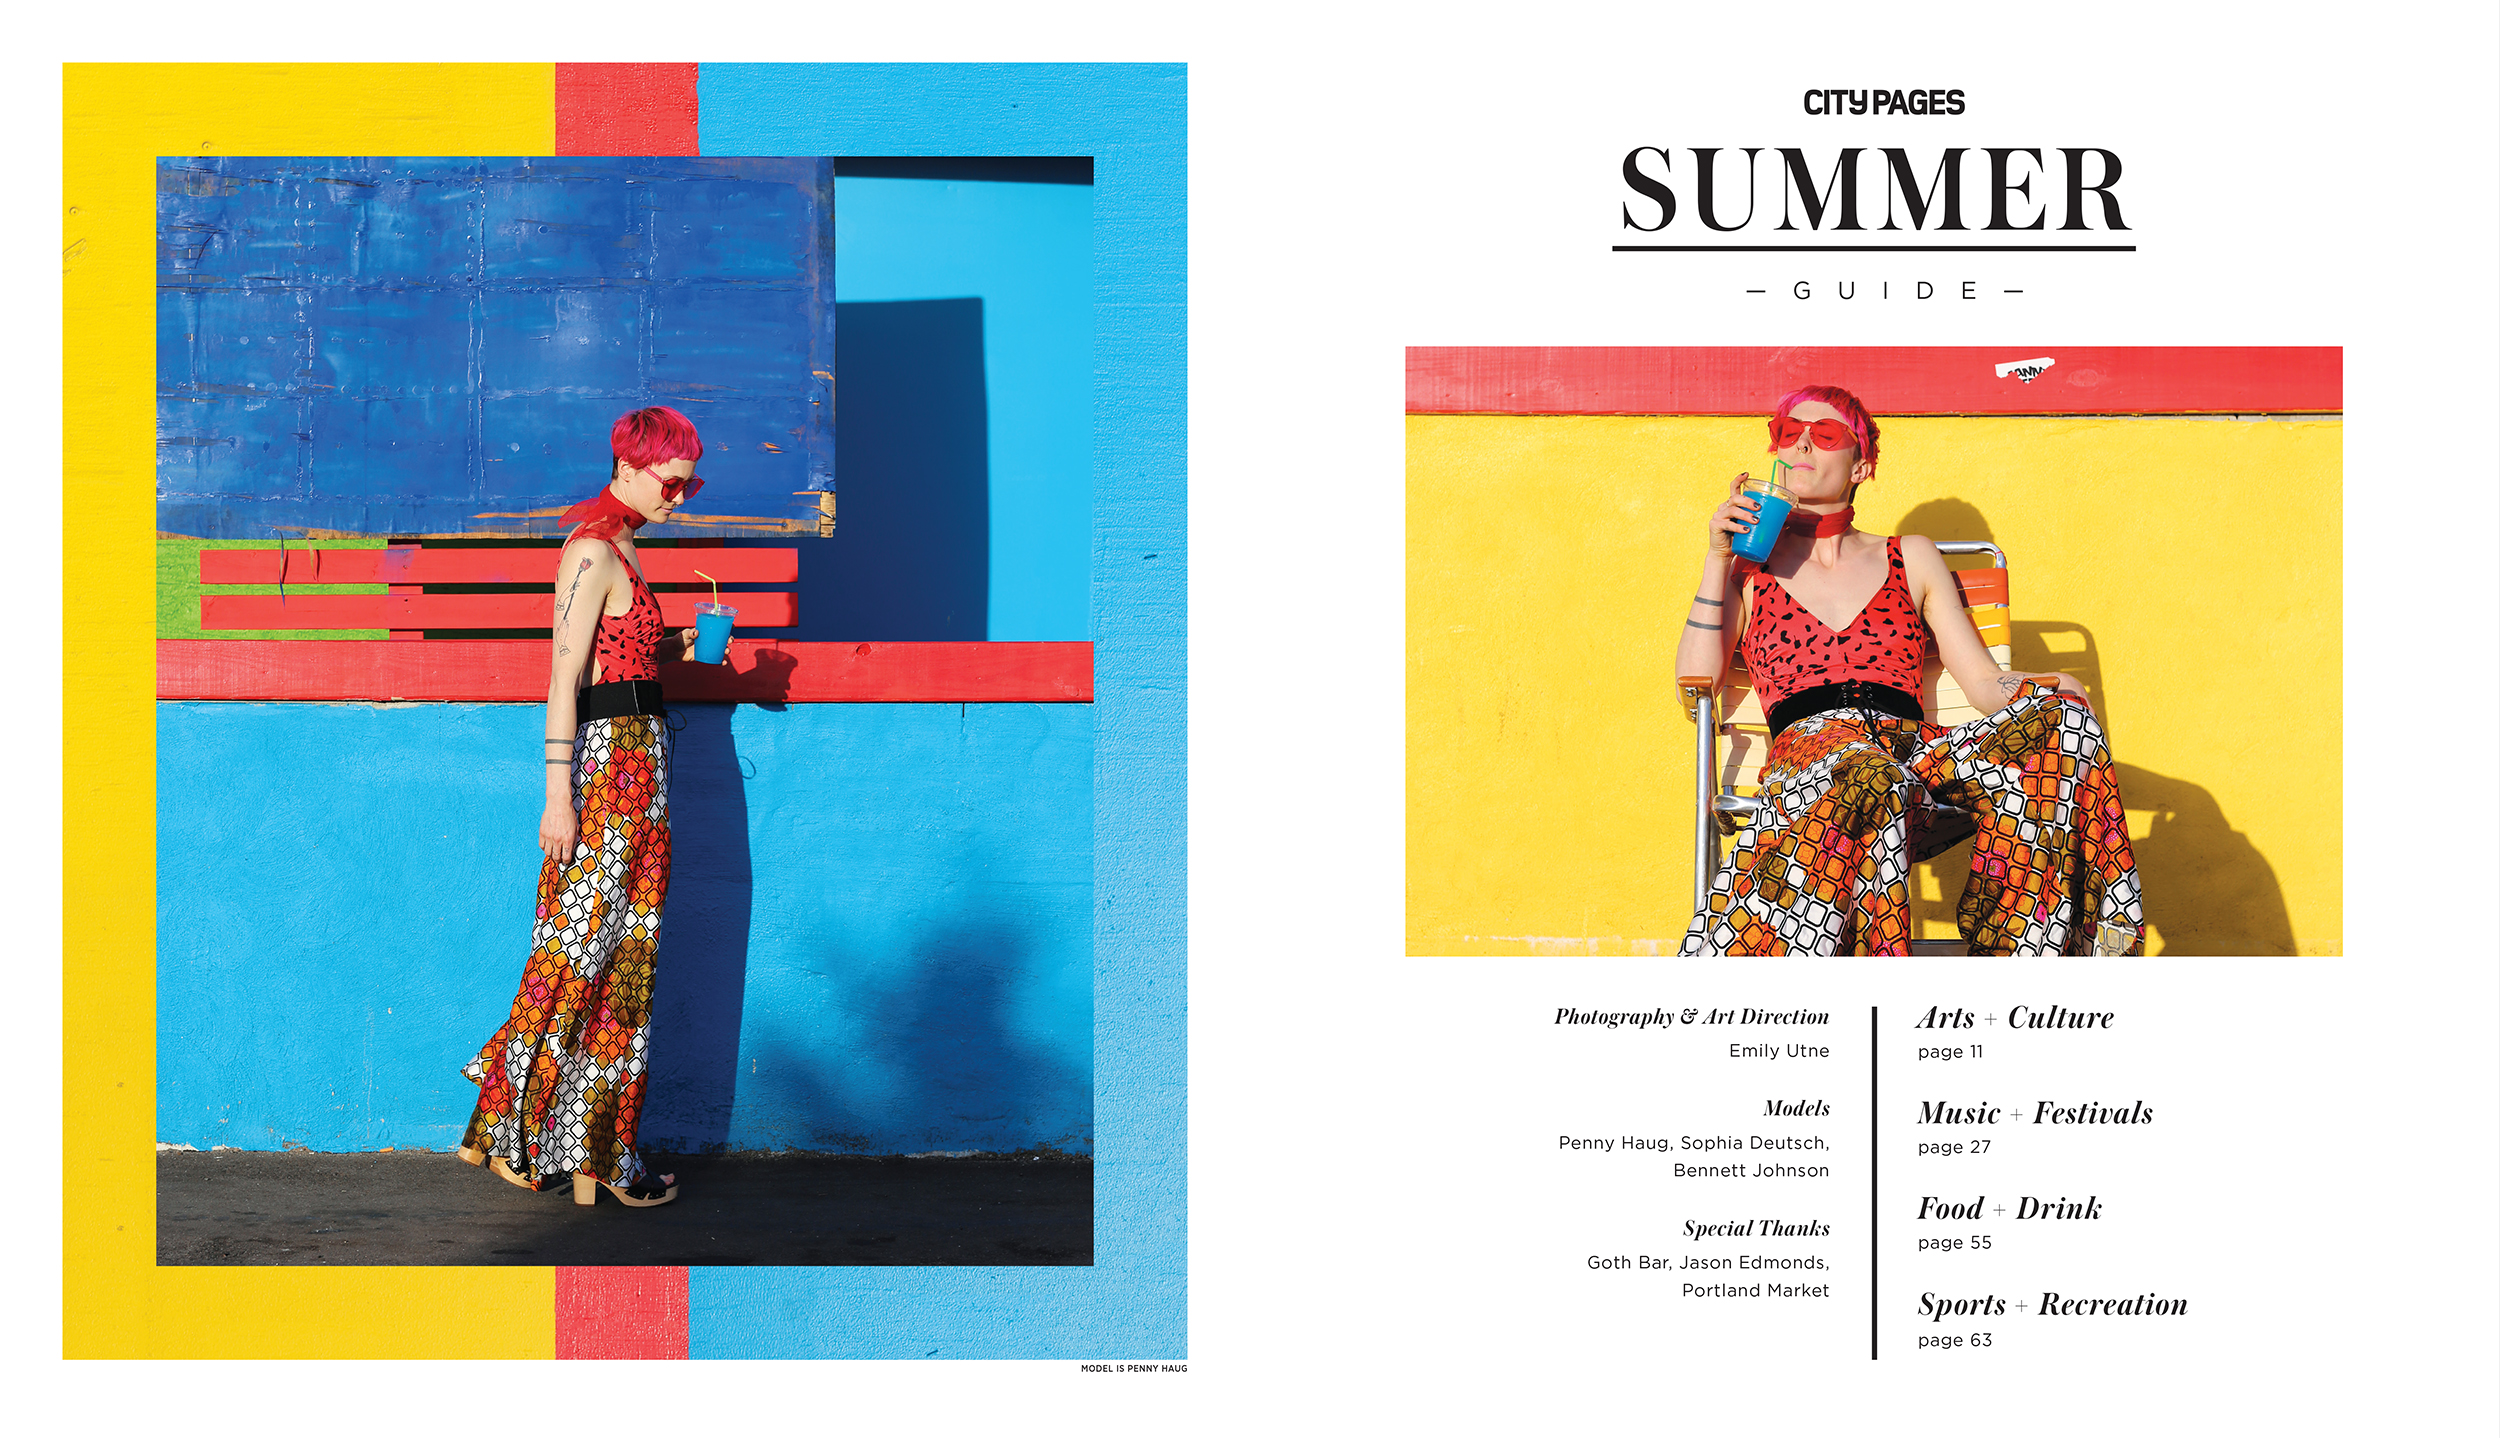 Summer-Guide-Layout.jpg